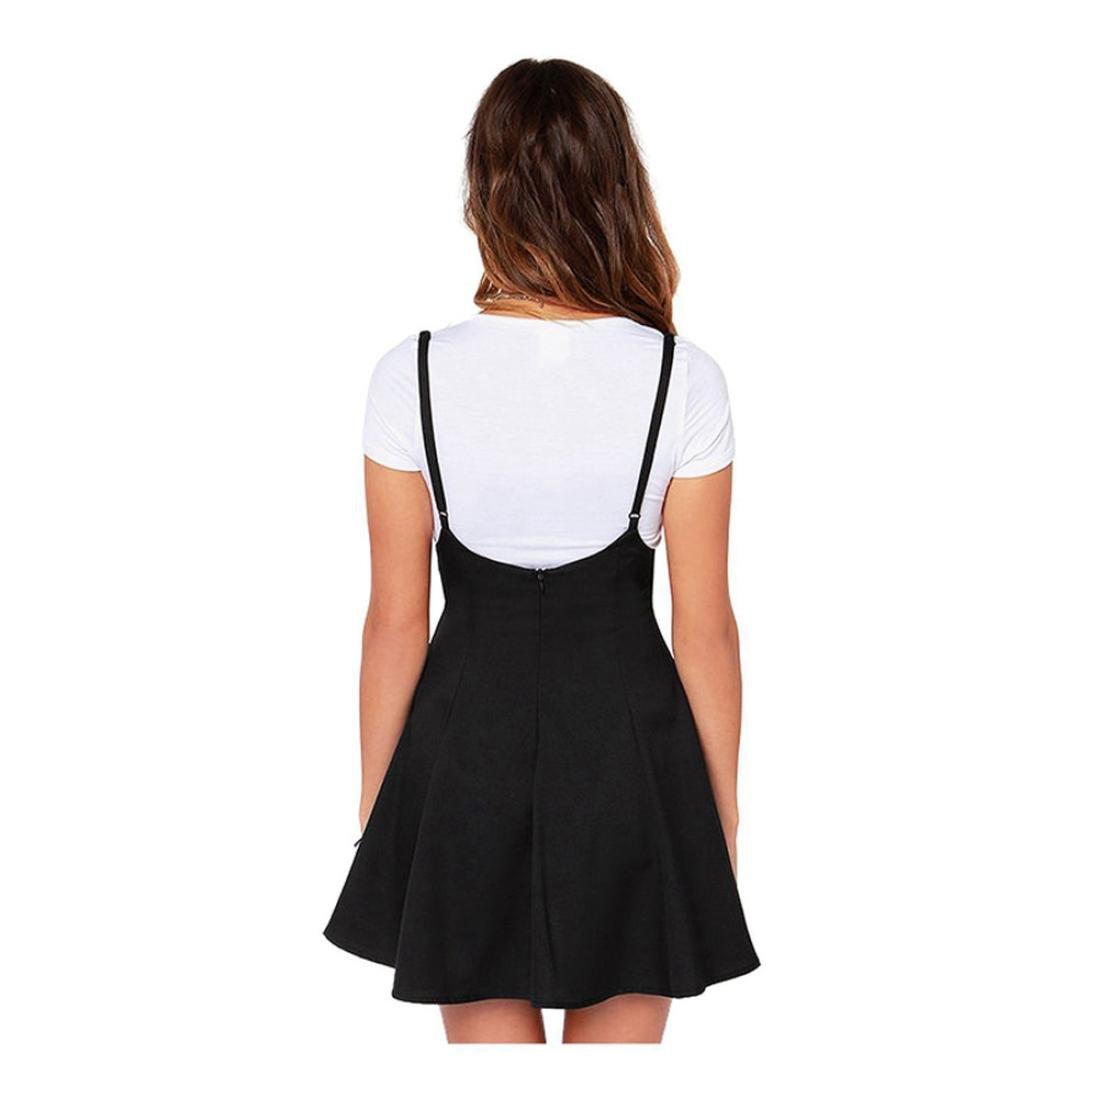 728676937a Women Suspender Skirts Daoroka Sexy Ladies Girl High Waist Pleated  Versatile Flared Skater Short Sleeve A Line Mini Swing Casual Fashion  Summer Gallus Dress ...